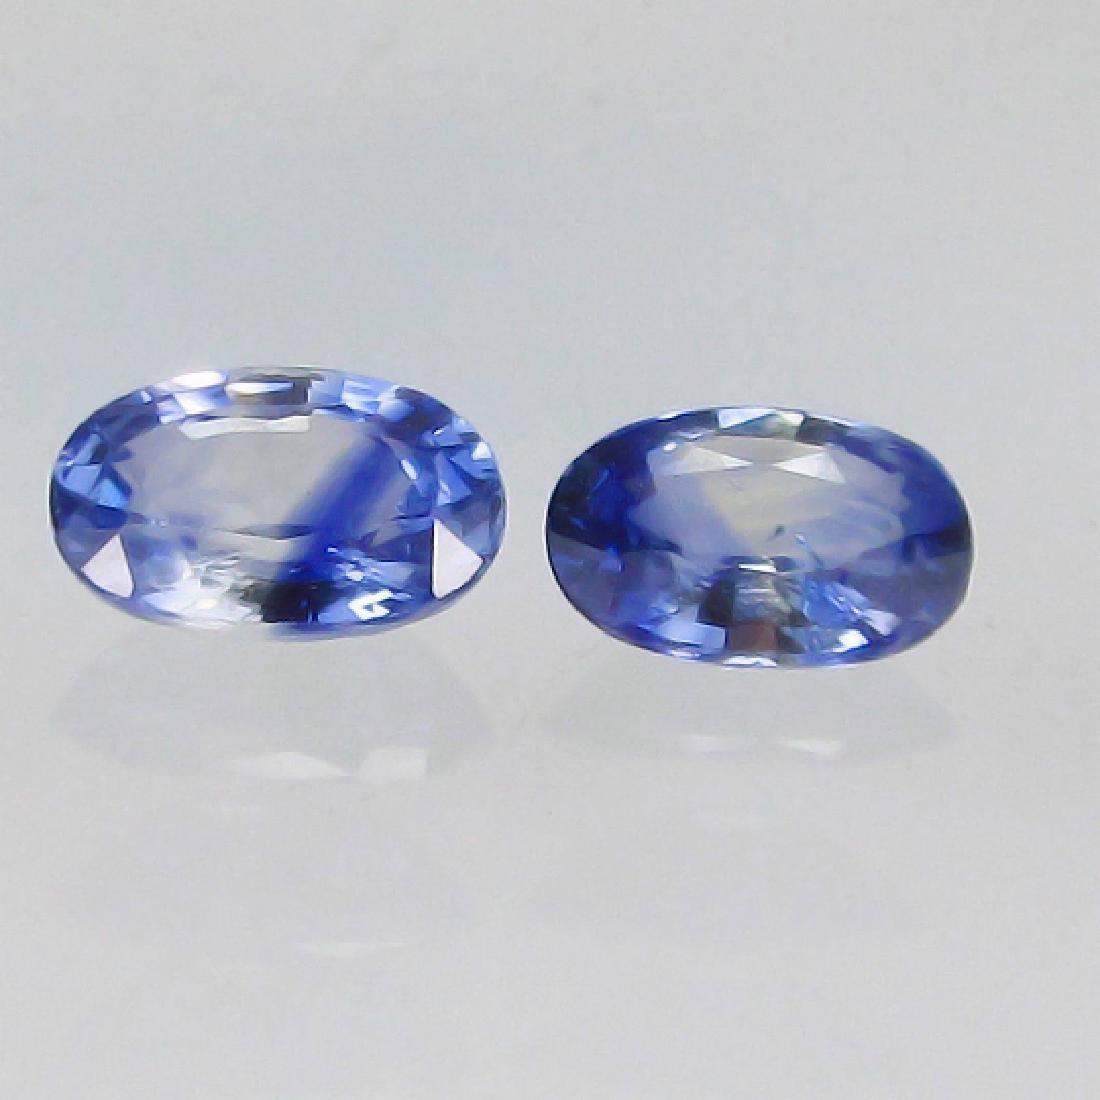 1.12 Ct Genuine Ceylon Blue Sapphire Oval cut Stones